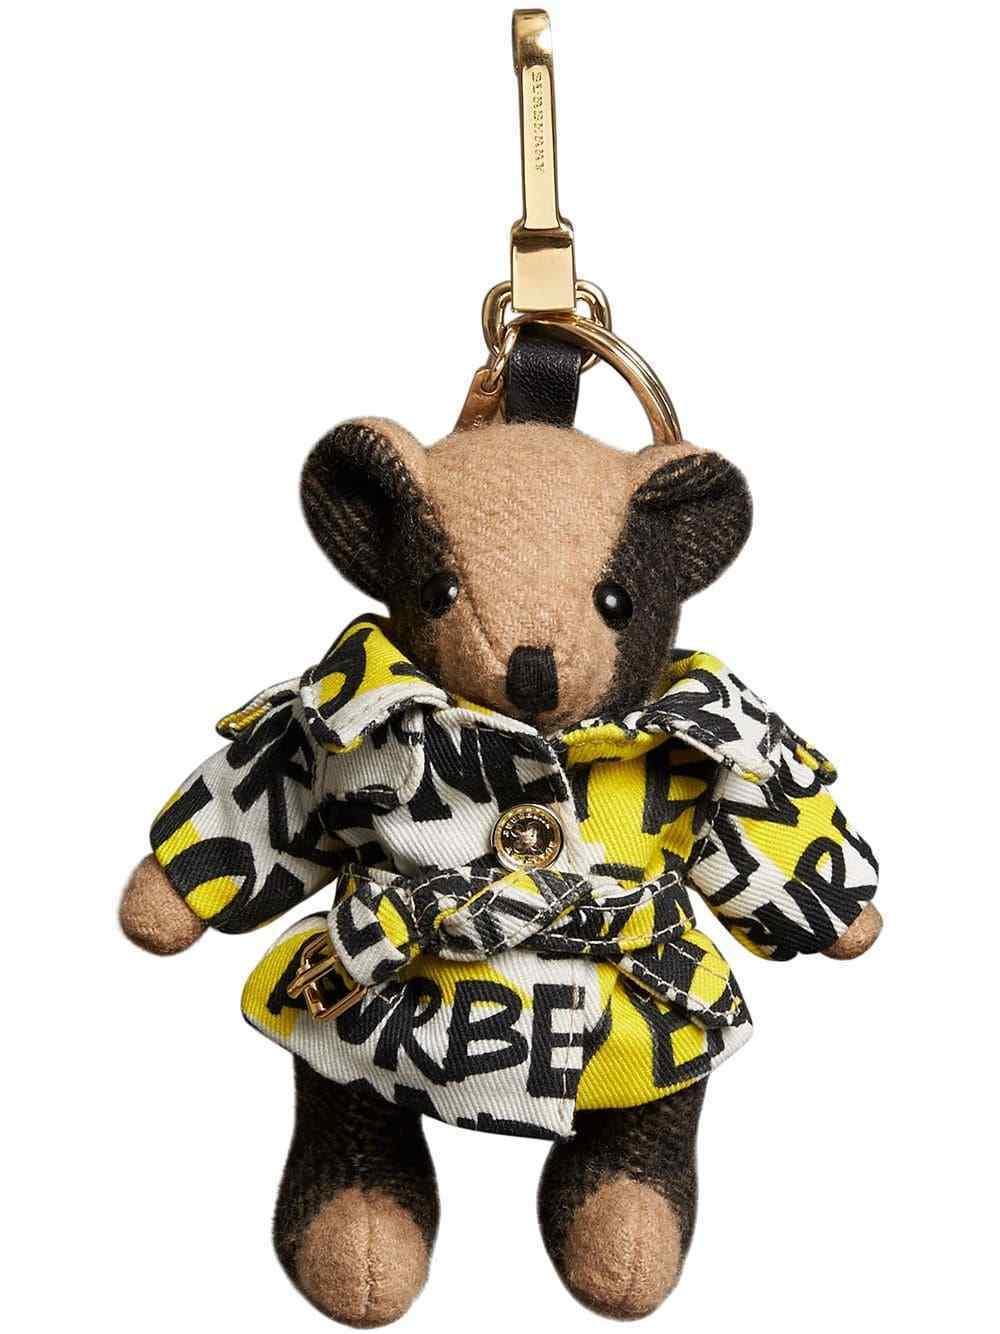 a29a80fccf26 Burberry Thomas Bear Bag Charm in Graffiti Print Trench Coat Key Fob ~NWT~  Box -  236.00